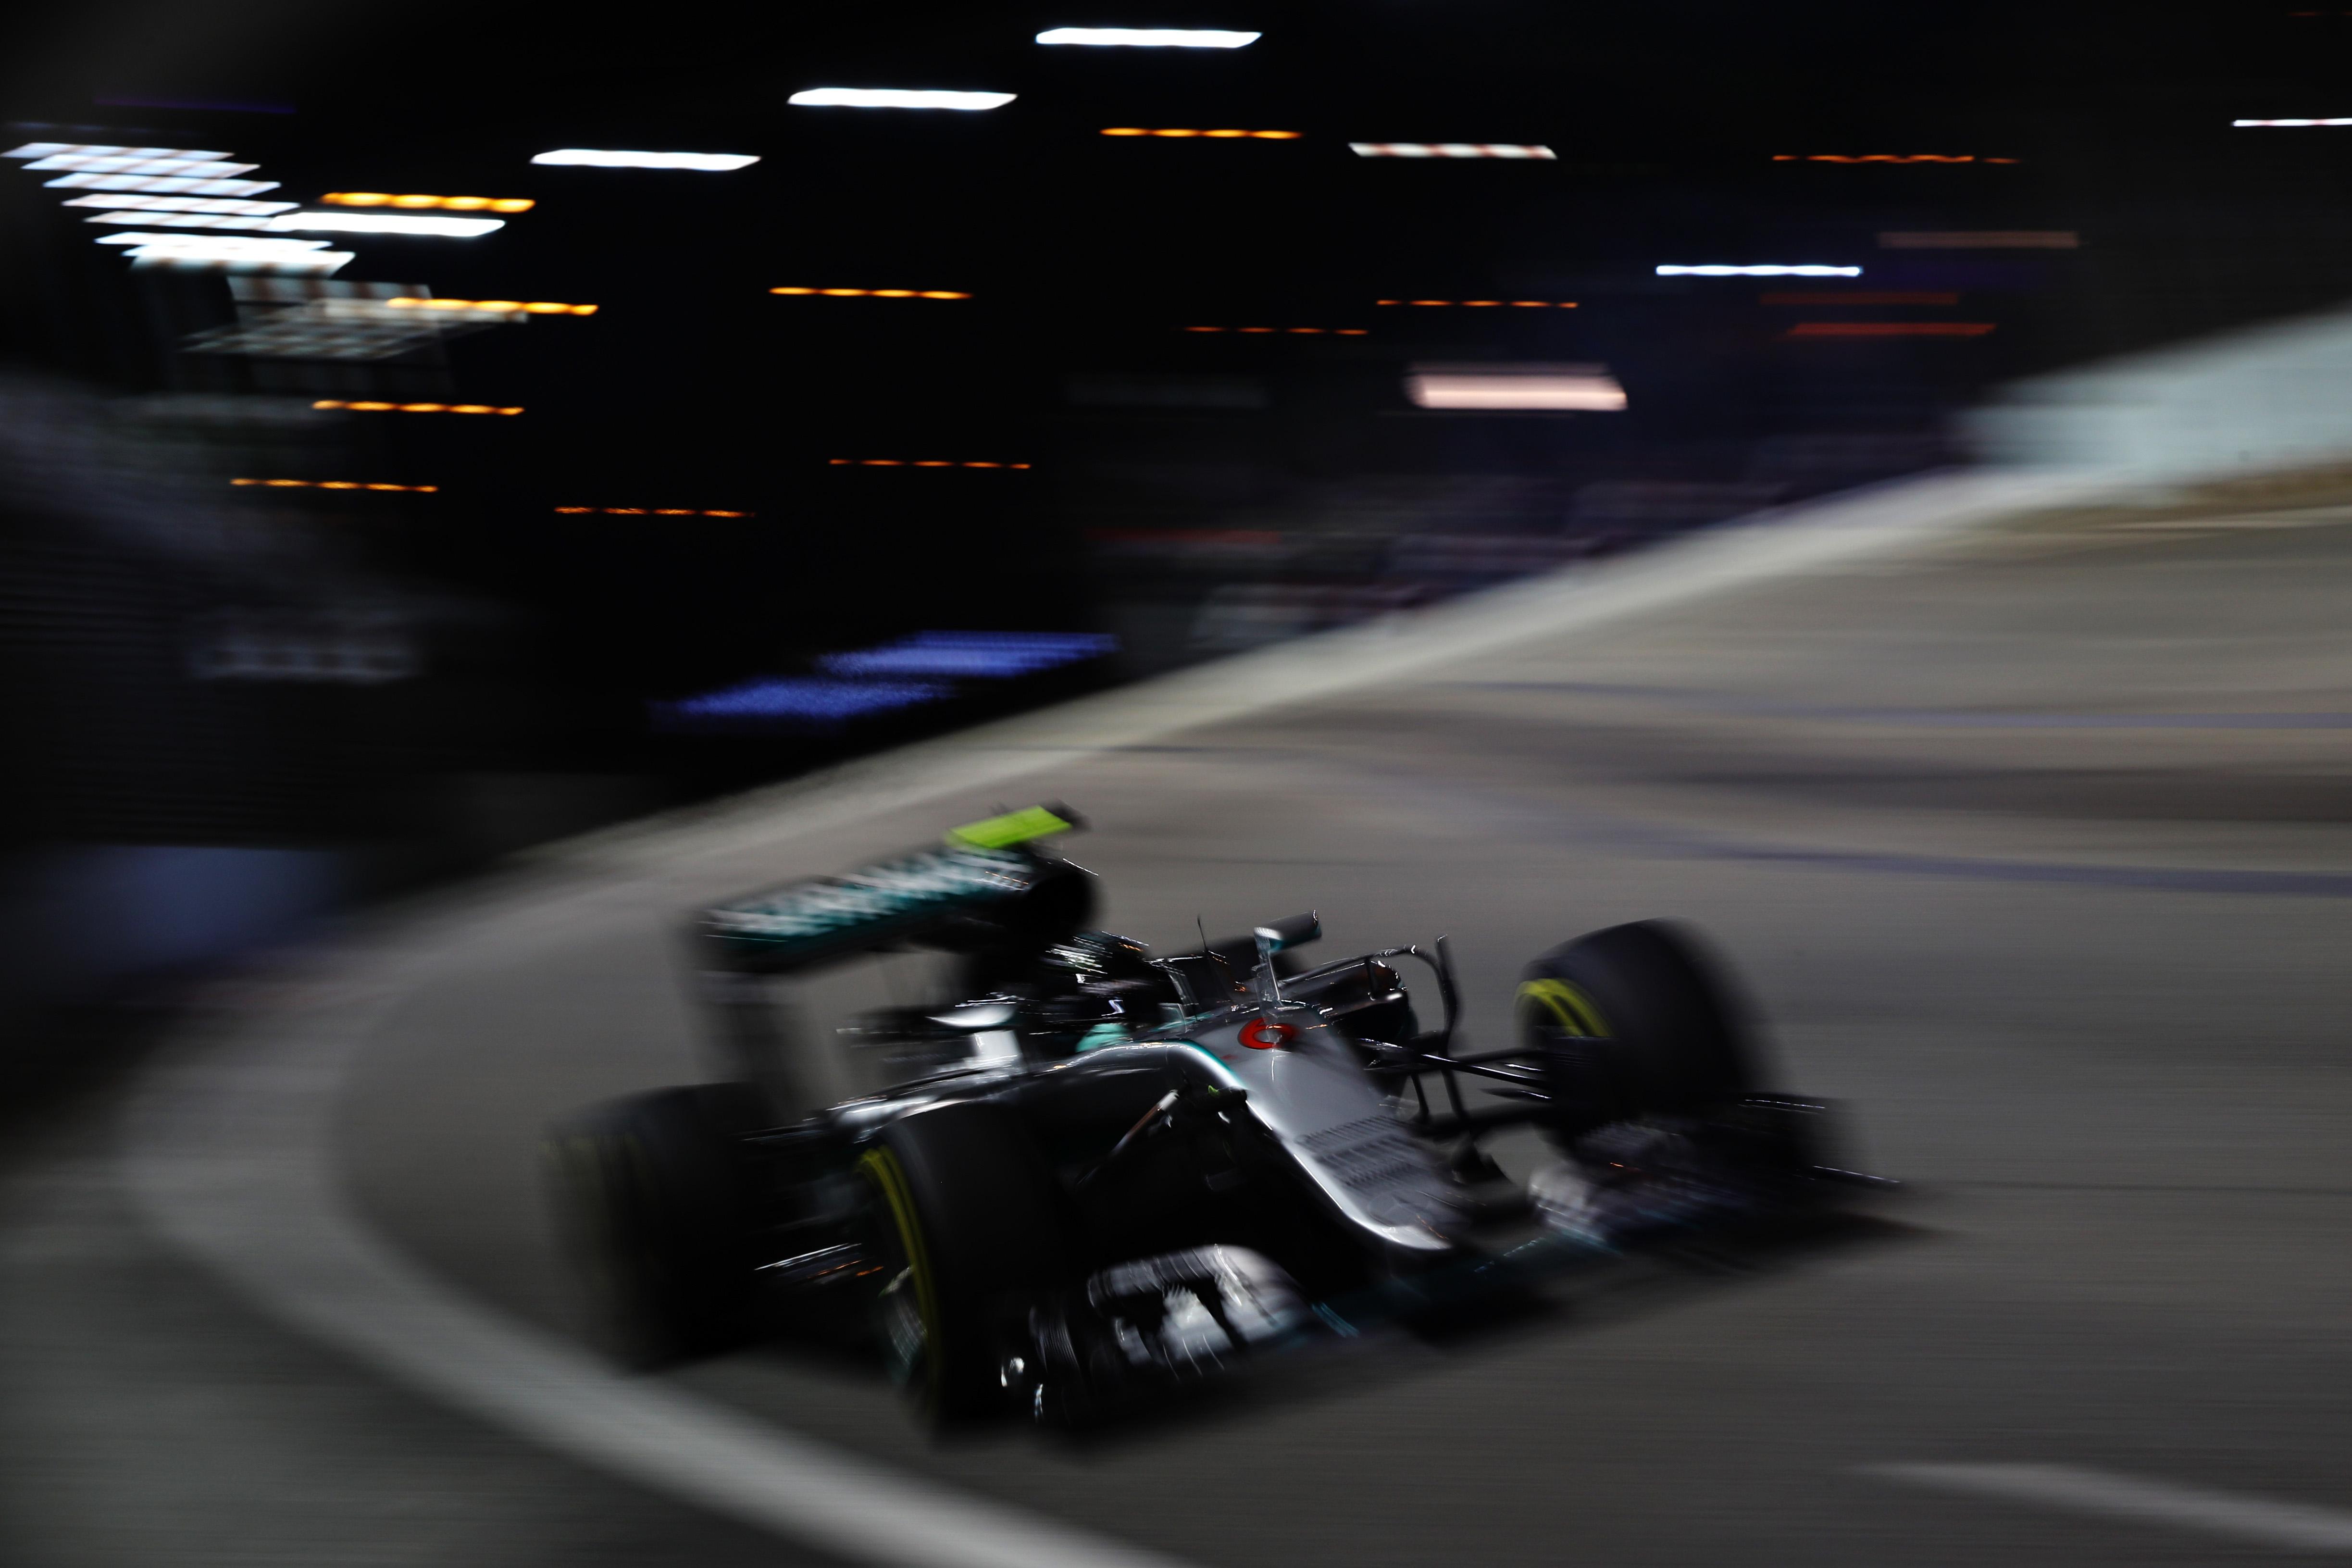 Singapore Grand Prix debrief: Nico Rosberg knocks Lewis Hamilton off top with dramatic victory